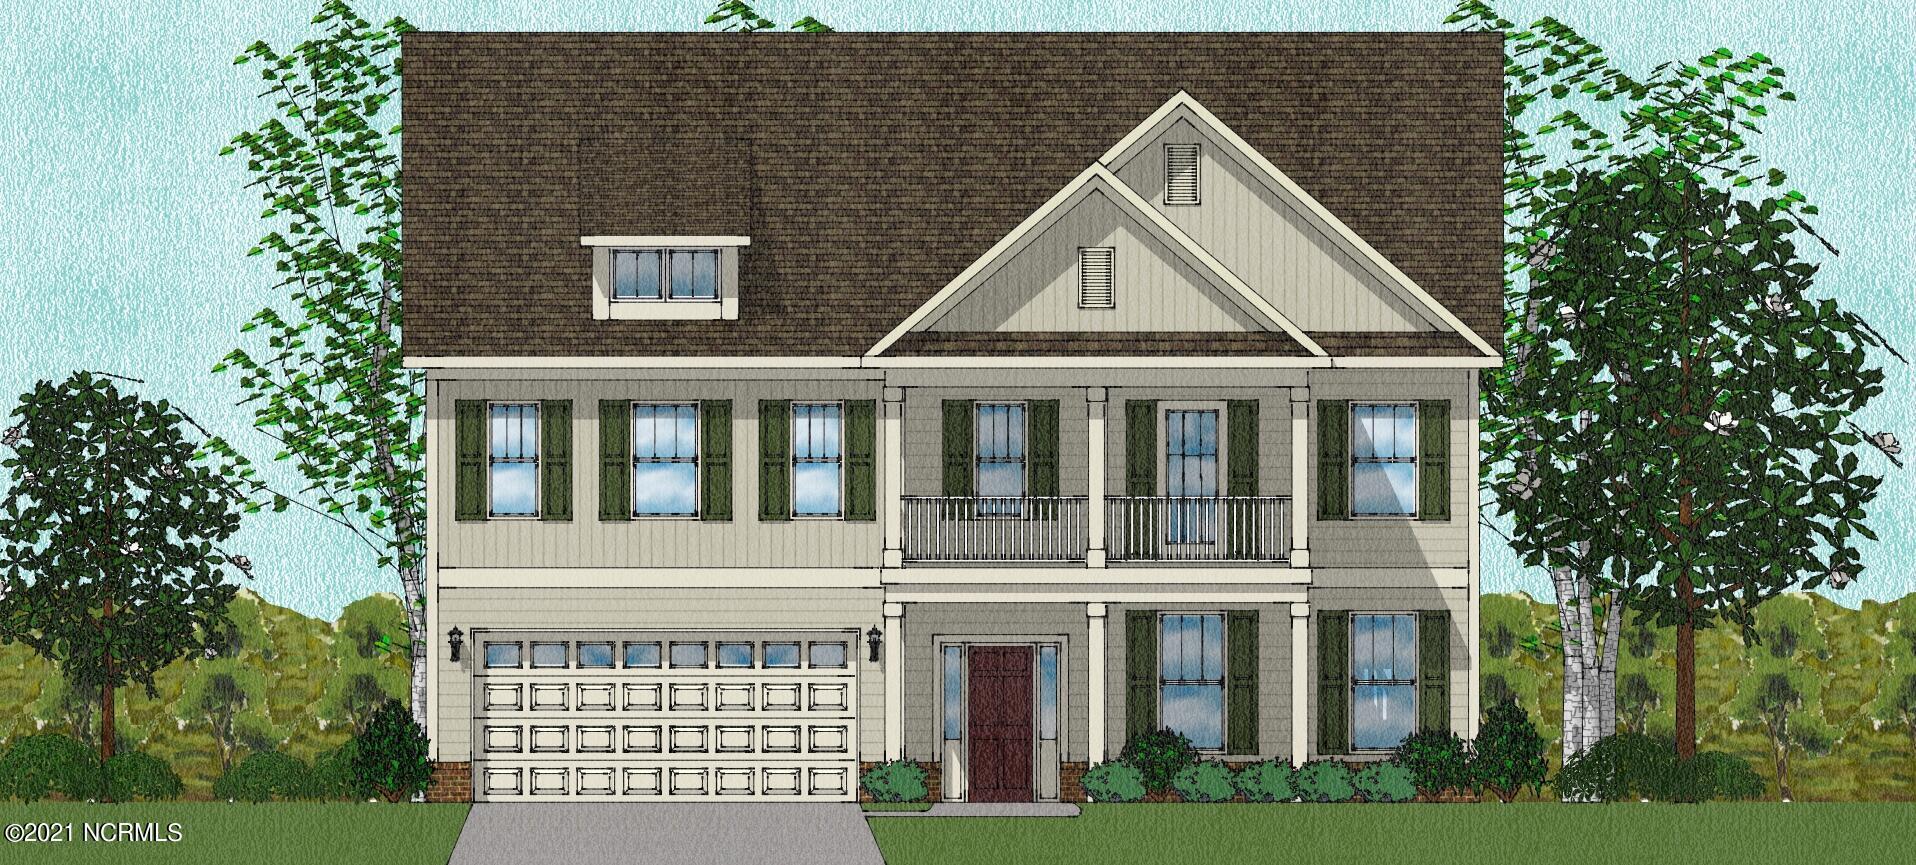 1272 Pandion Drive, Wilmington, North Carolina 28411, 5 Bedrooms Bedrooms, 13 Rooms Rooms,4 BathroomsBathrooms,Single family residence,For sale,Pandion,100286266